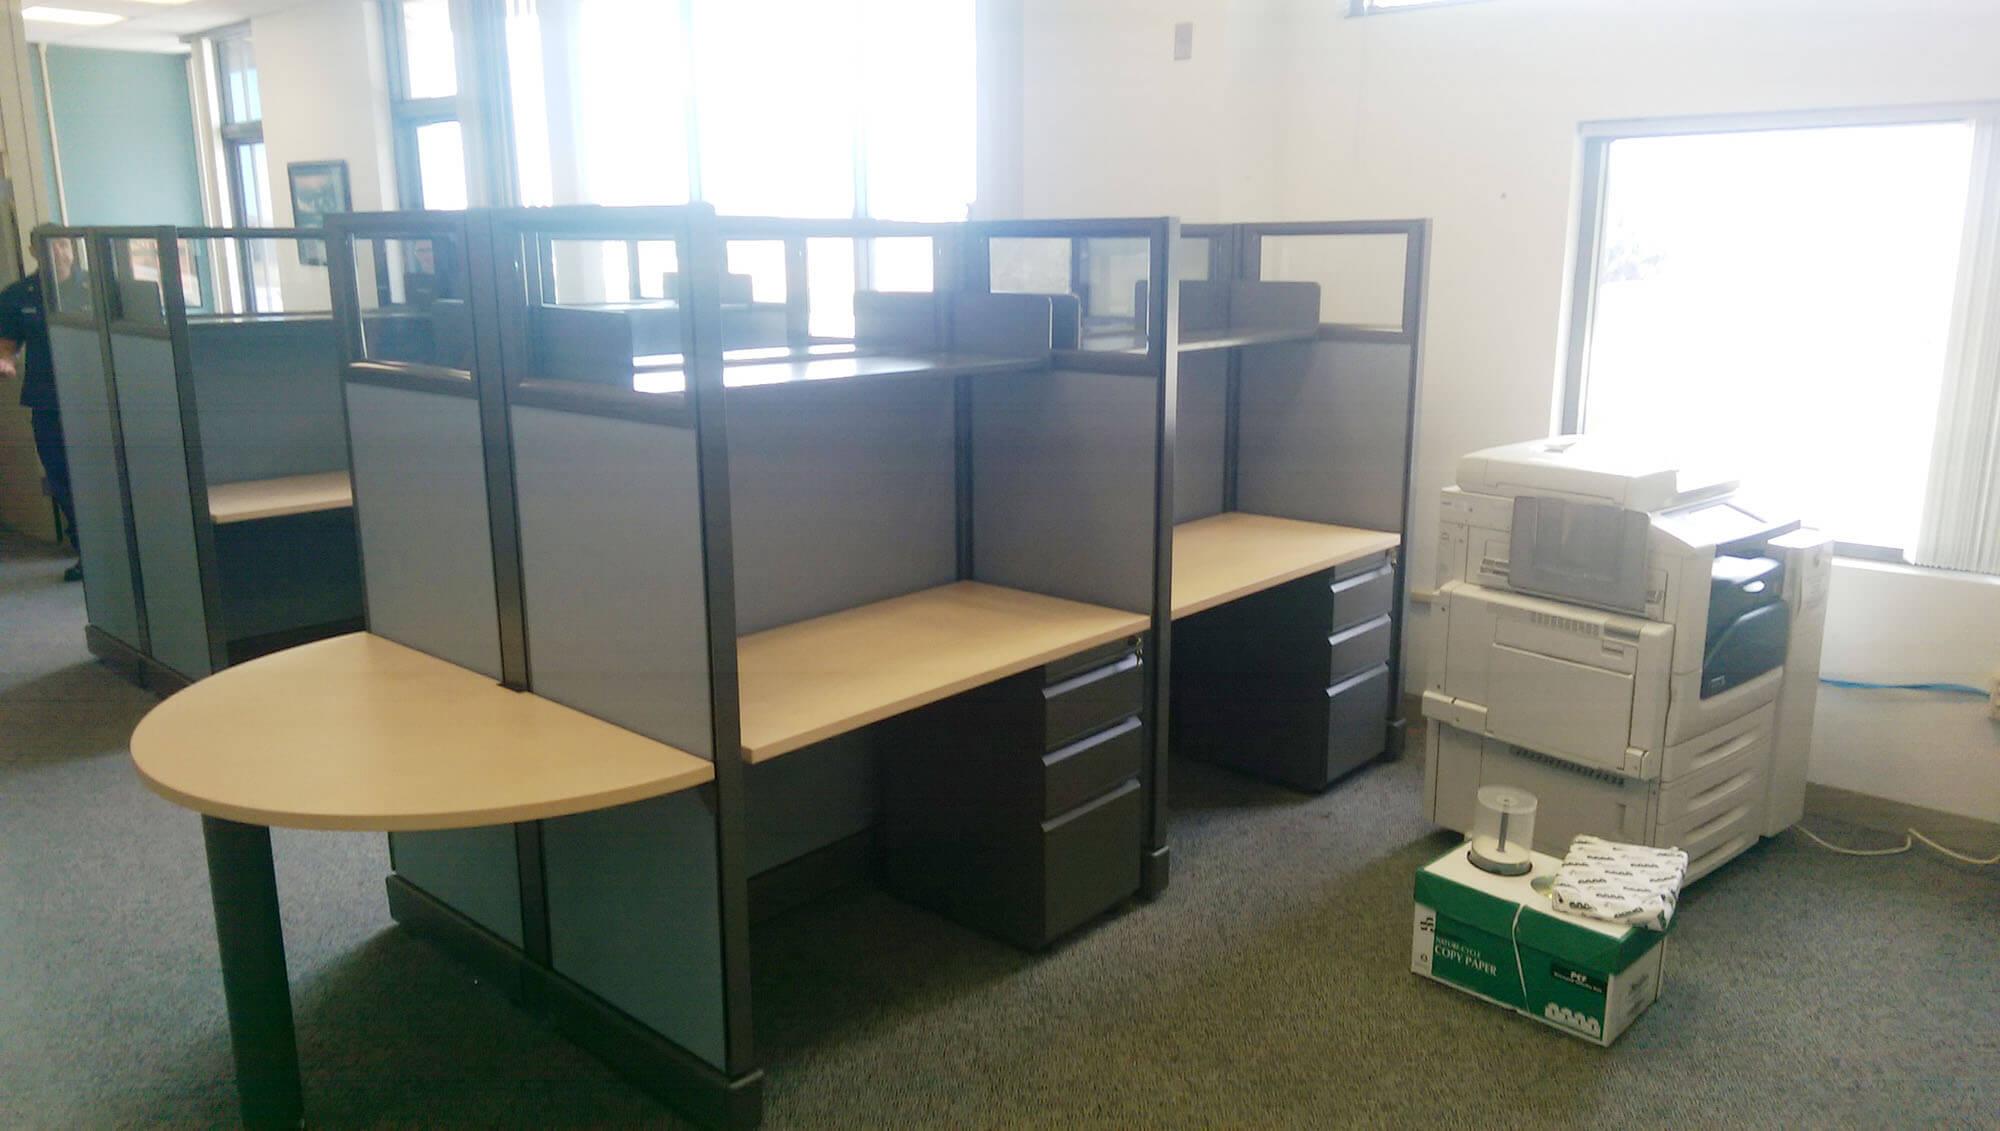 Office Furniture: Office Design, Furniture Installation In Petalum, CA